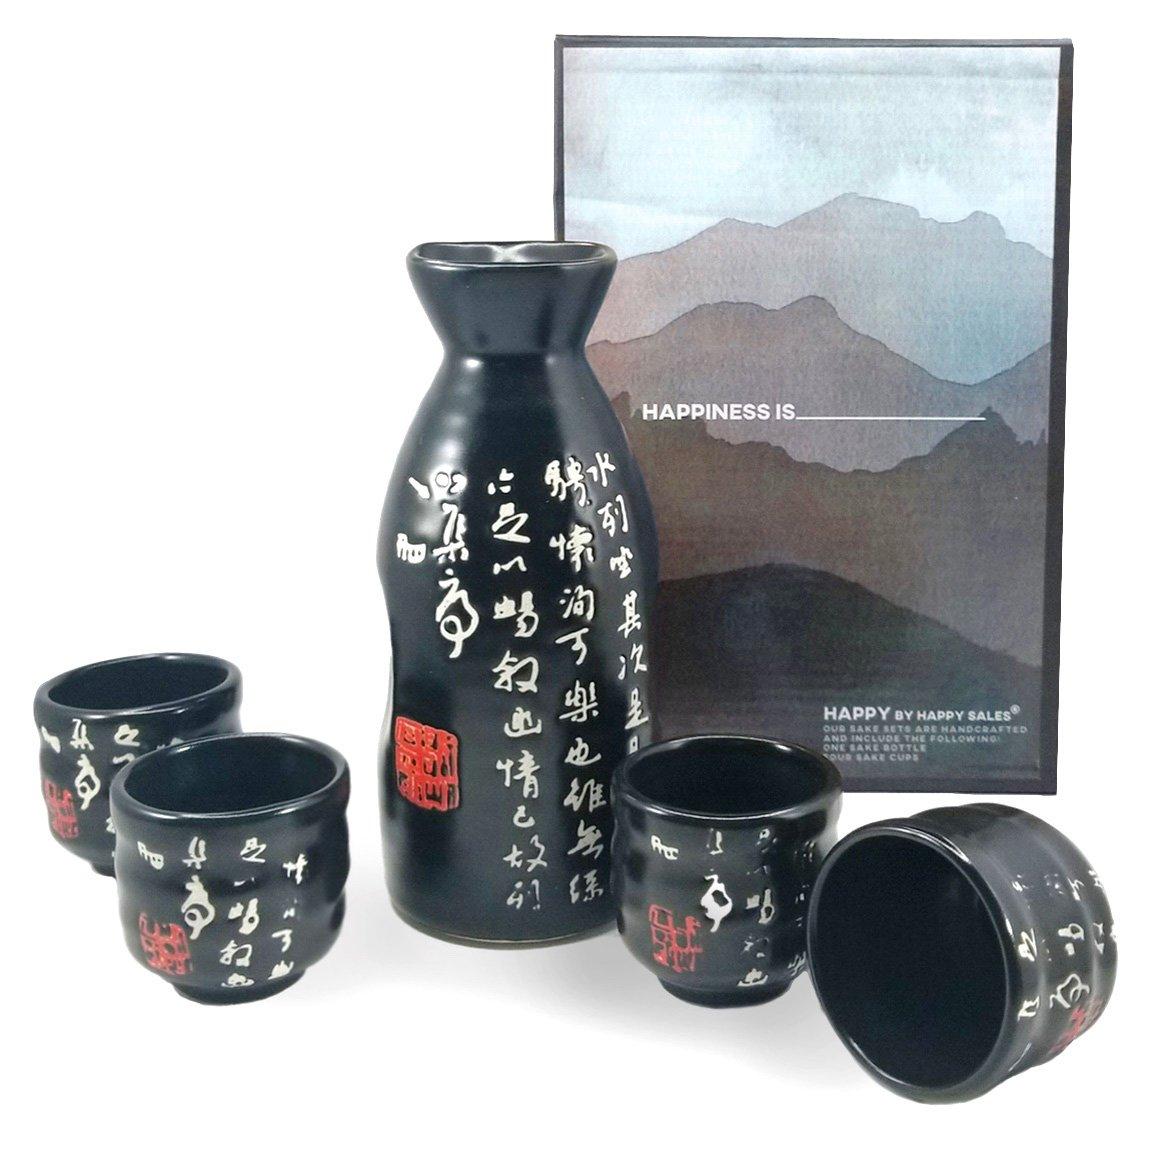 Happy Sales HSSS-PMB07, 5 Pc Sake set Calligraphy Black & White